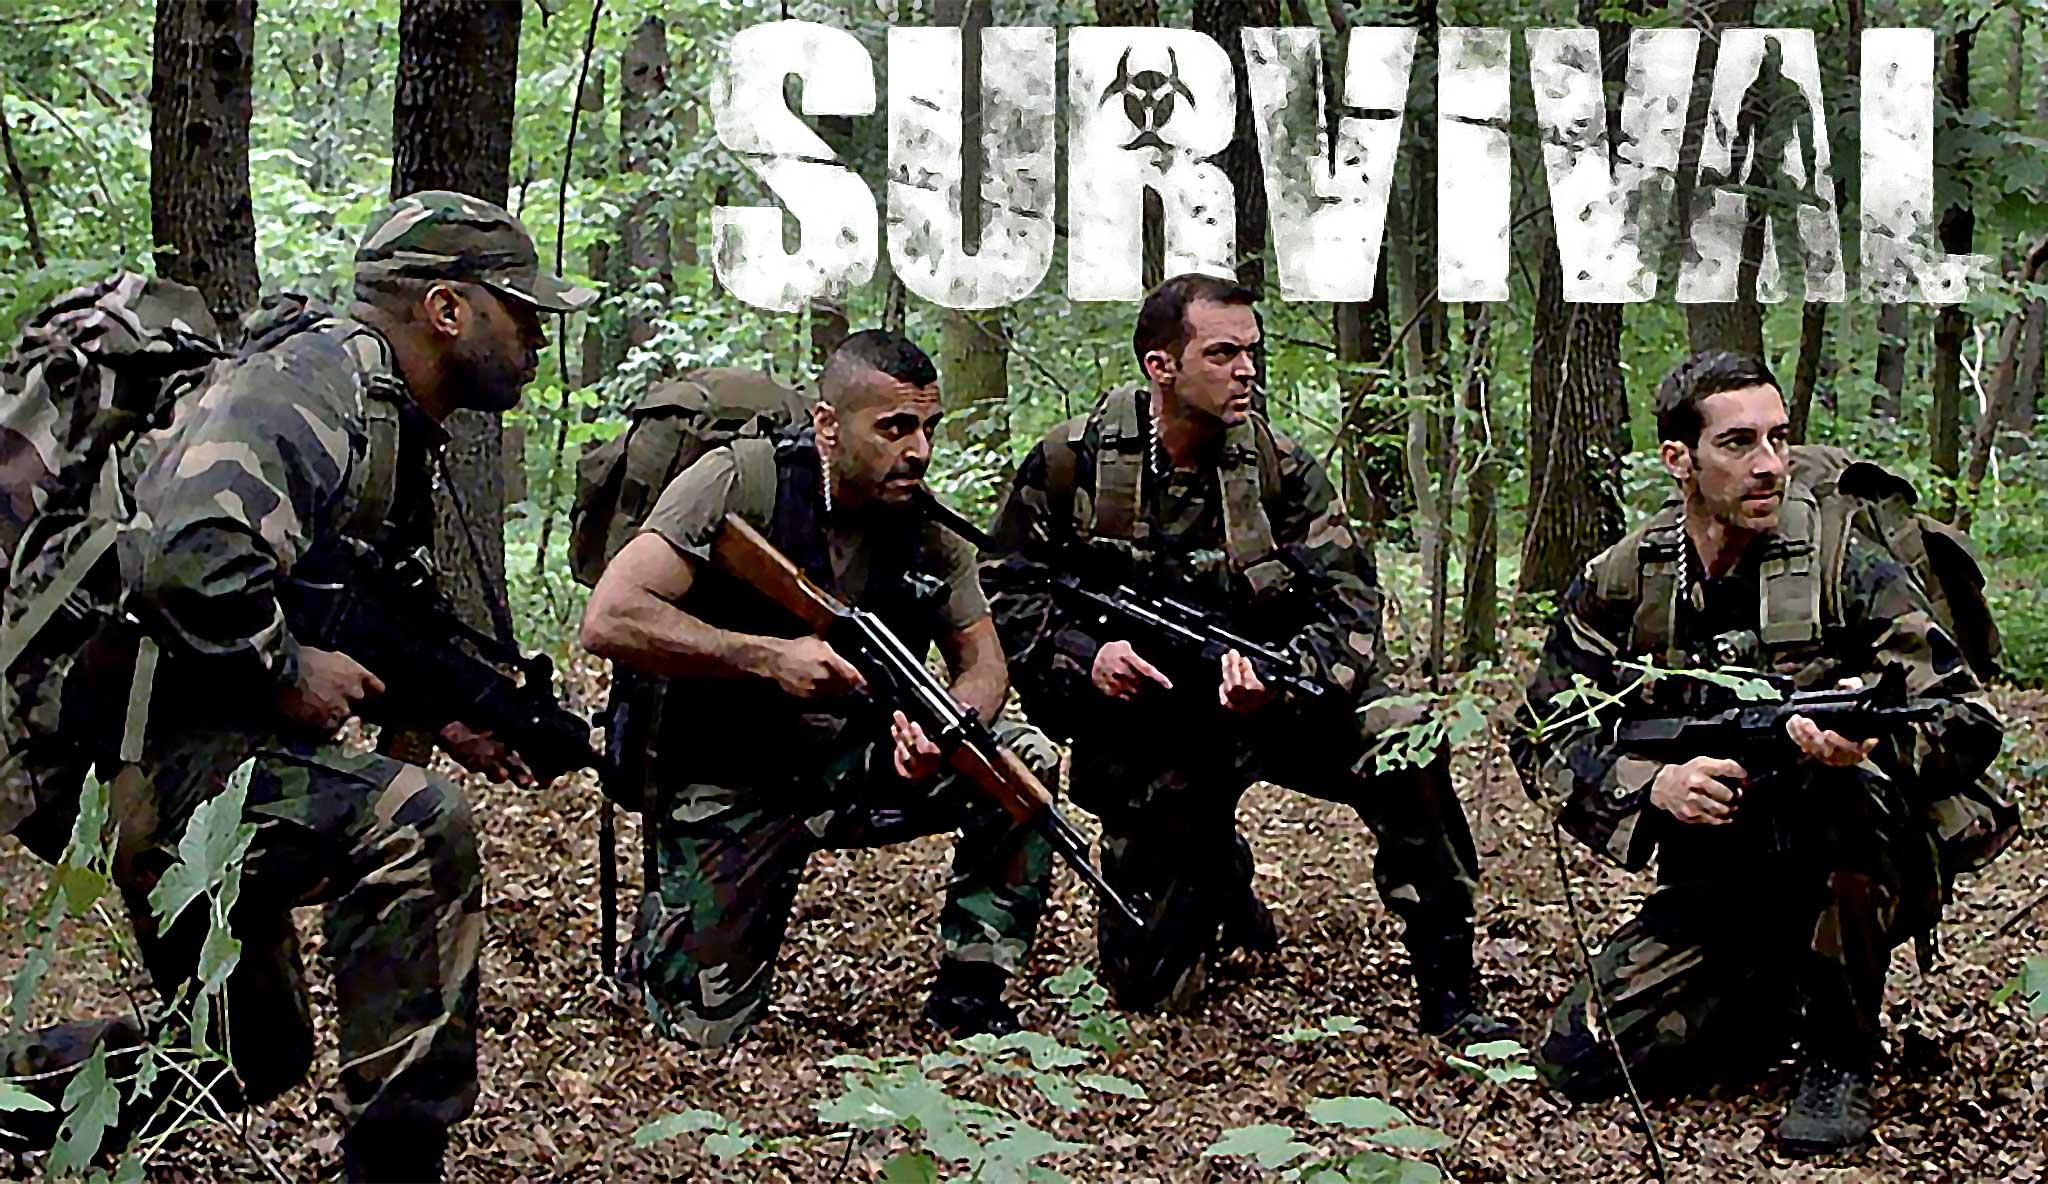 survival-uberleben\header.jpg